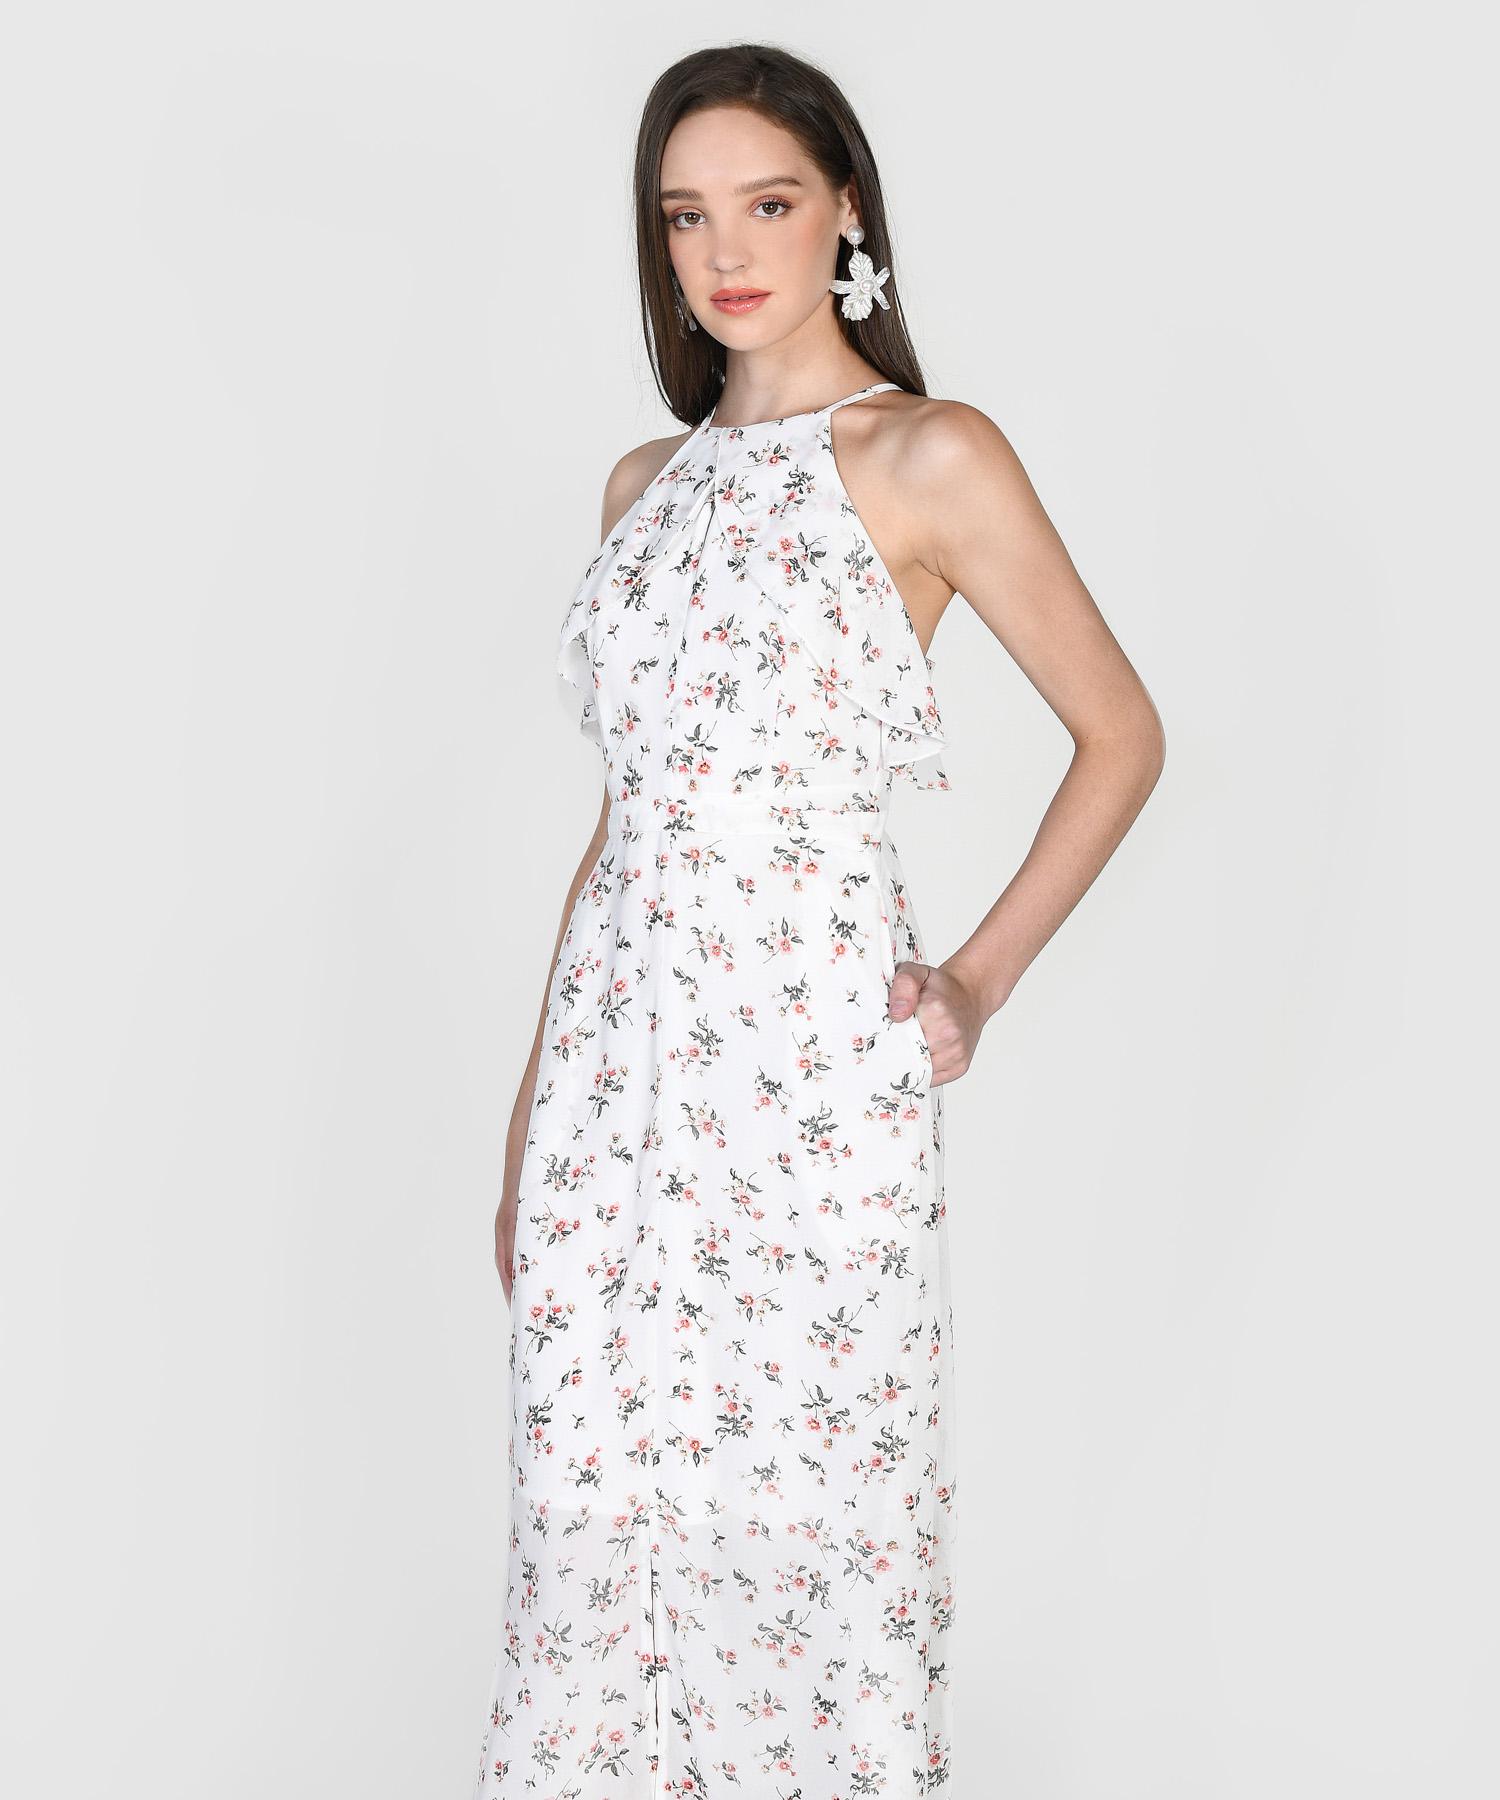 gemmill-floral-maxi-dress-white-1